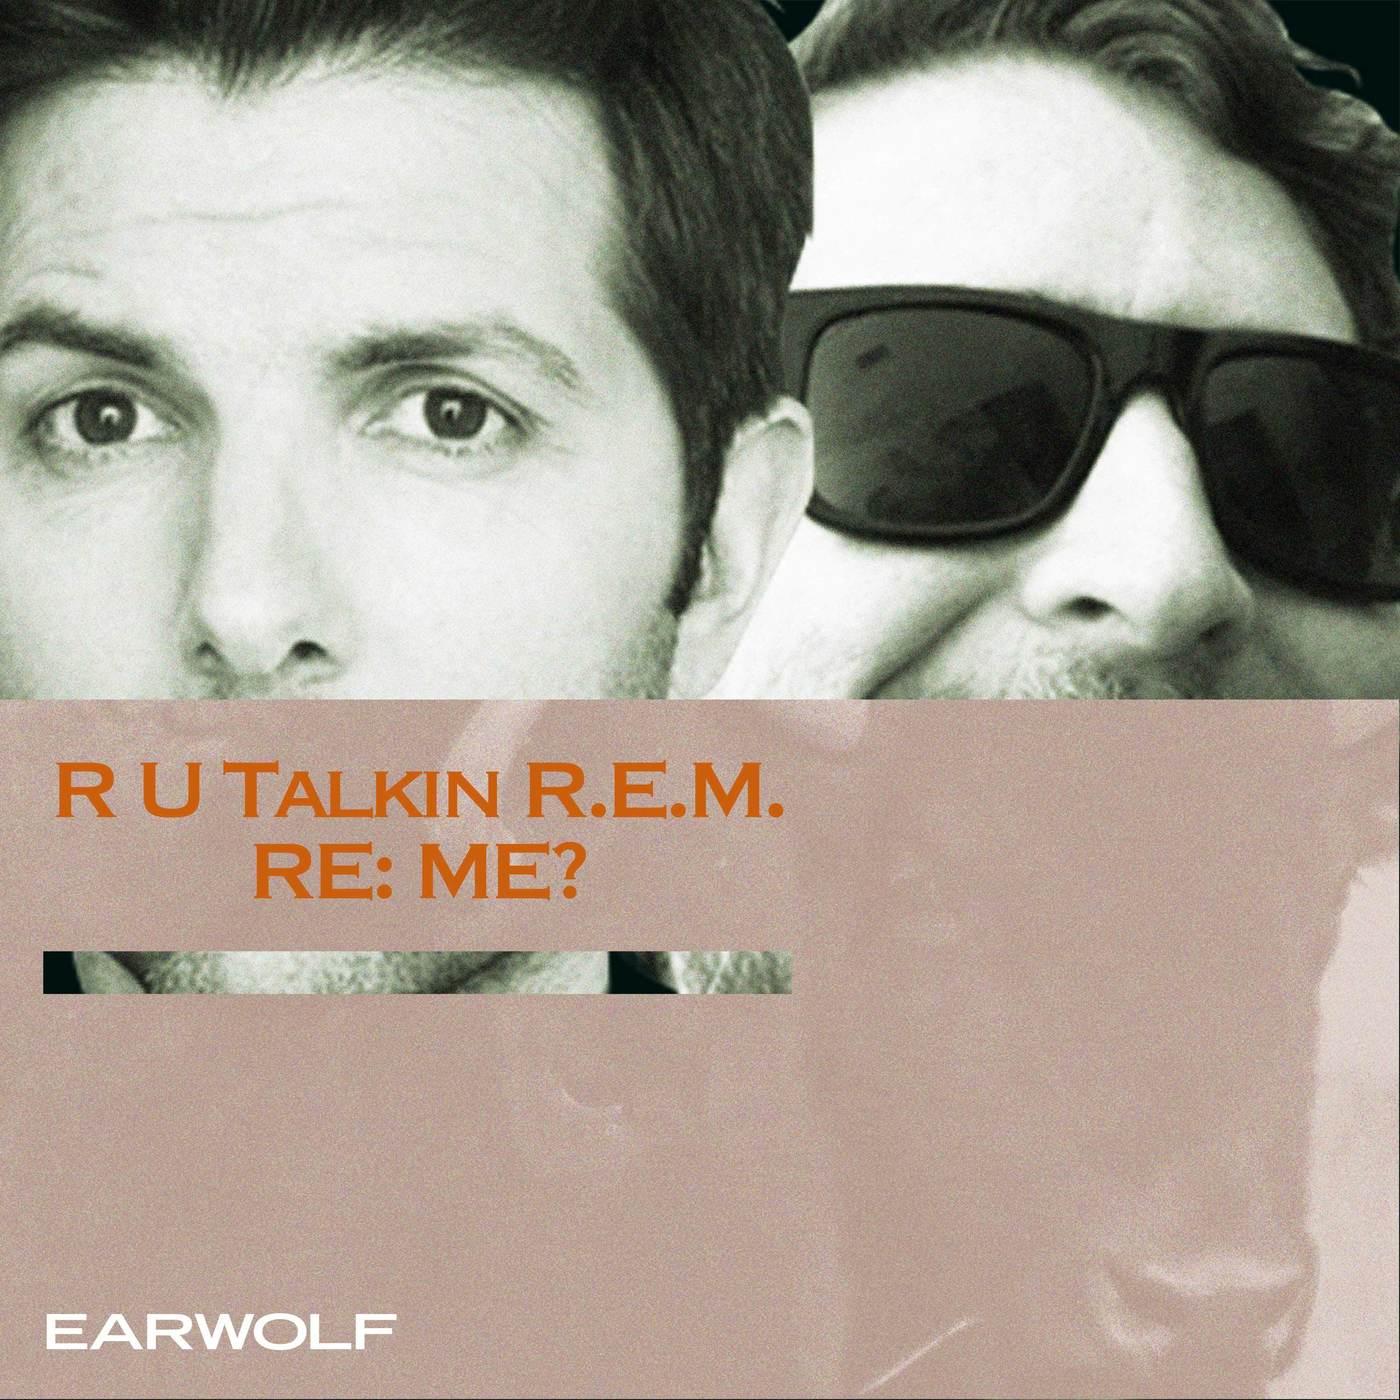 are you talking rem re me_logo.jpeg